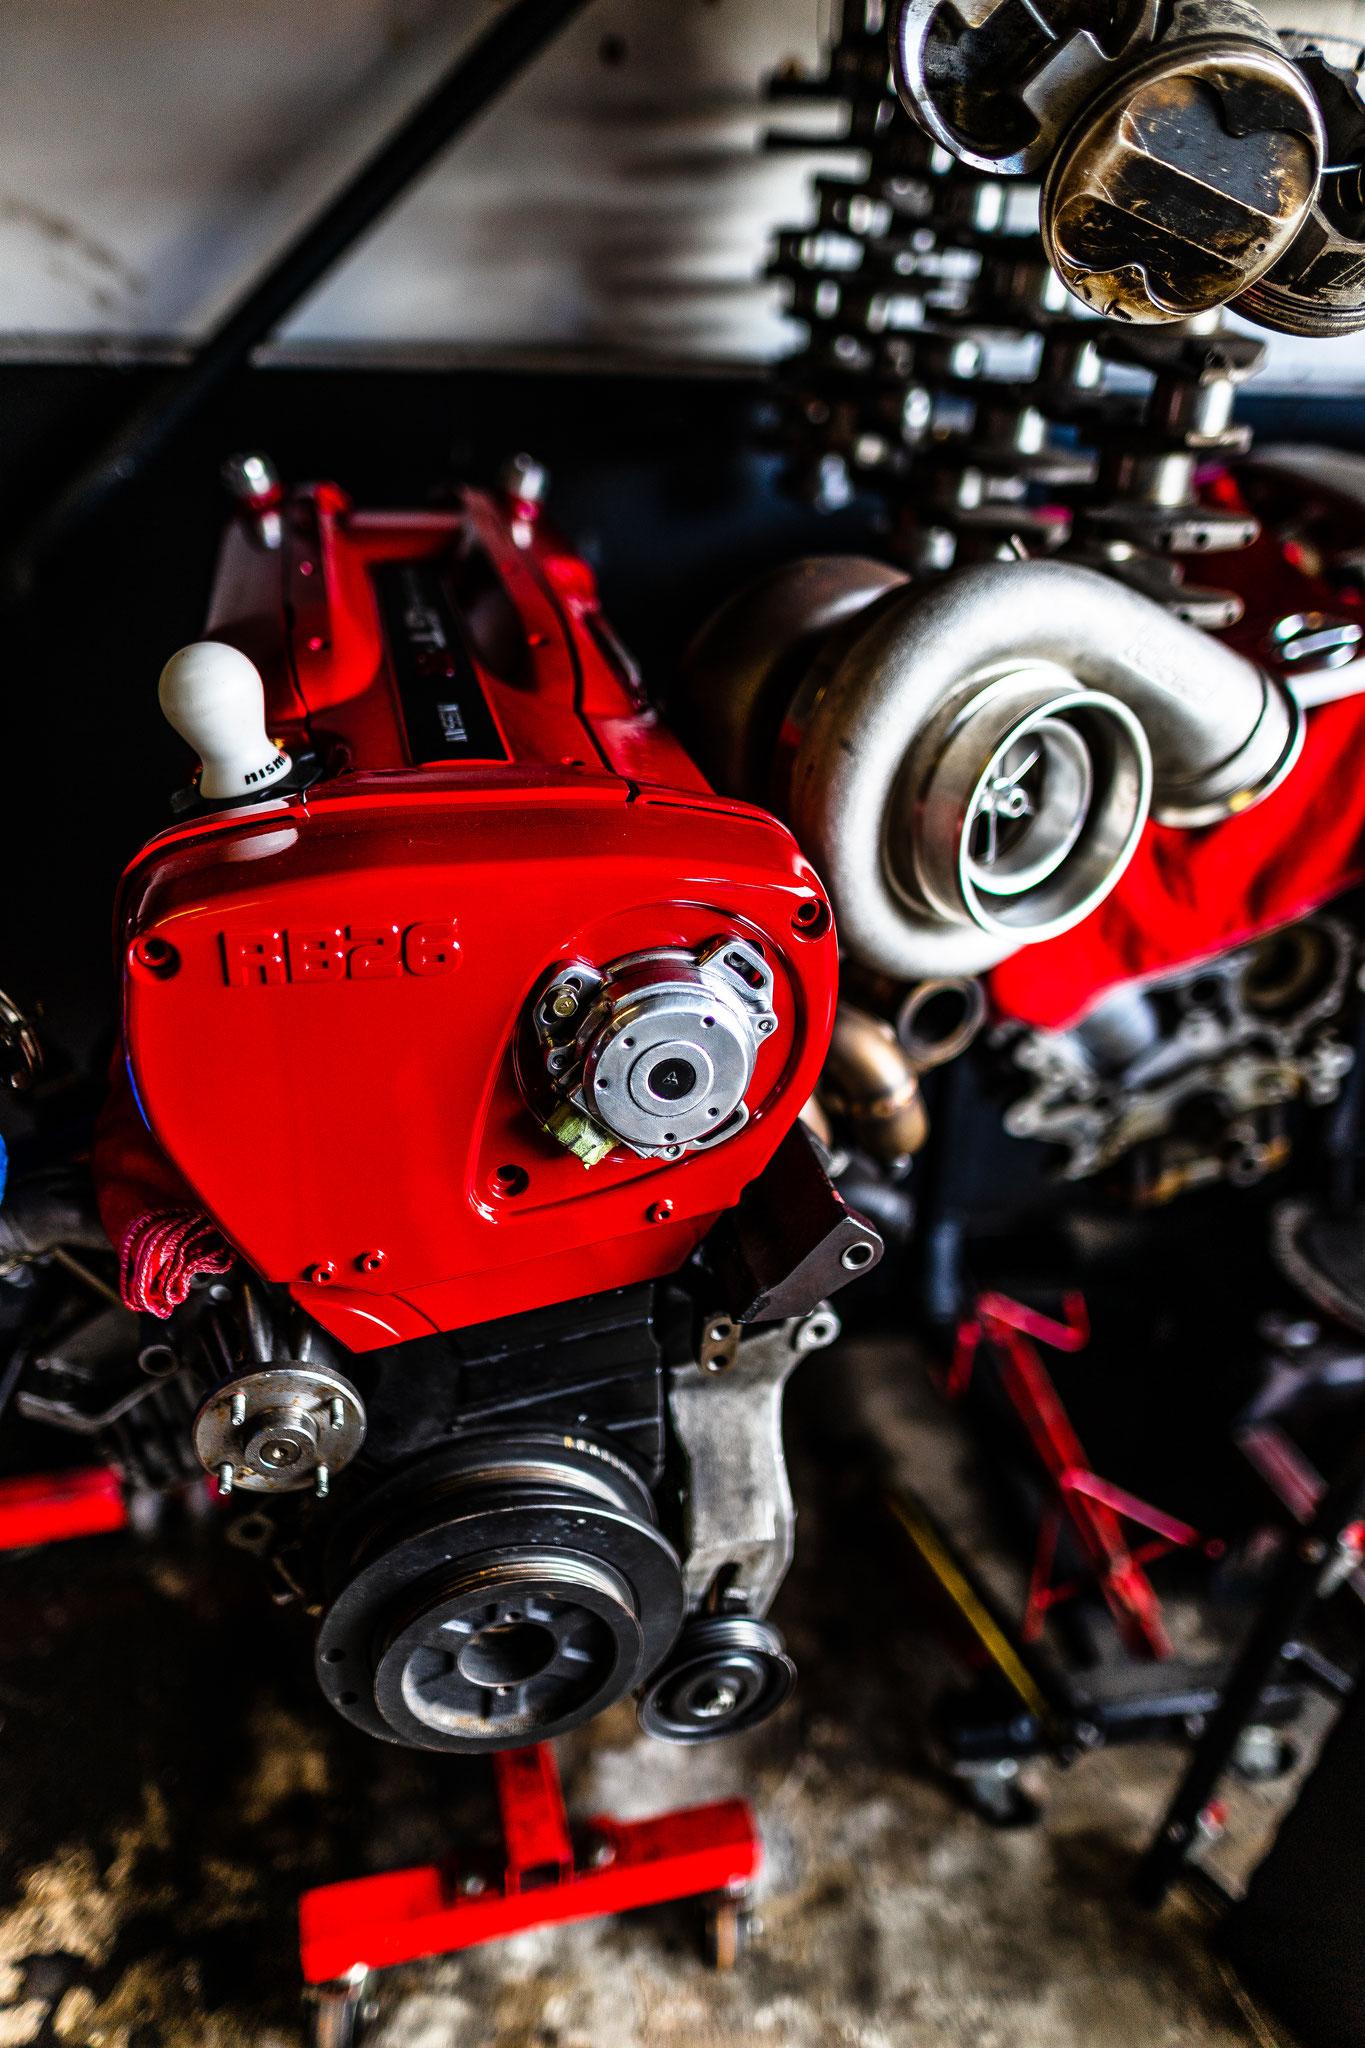 R32 R33 R34 TURBO KITS - originalautoperformance